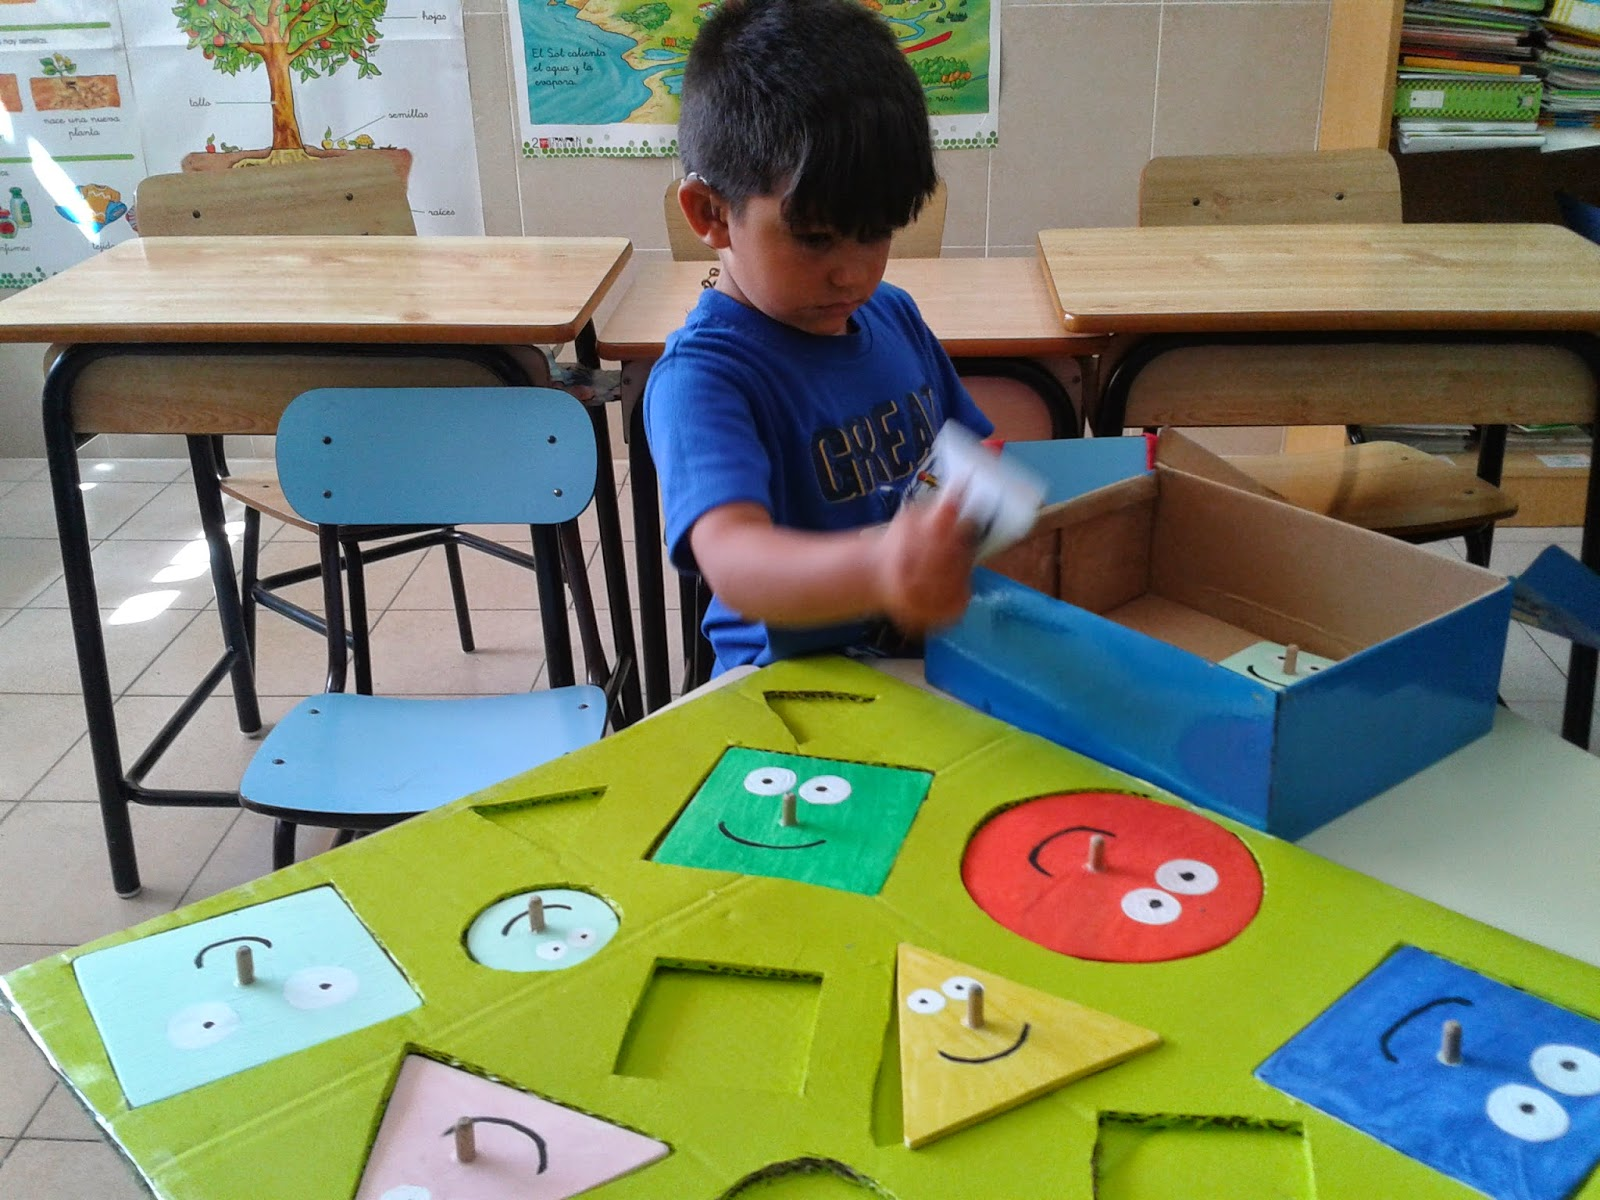 Geometr a en el jard n infantil matem ticas y tics en for Aprendiendo y jugando jardin infantil